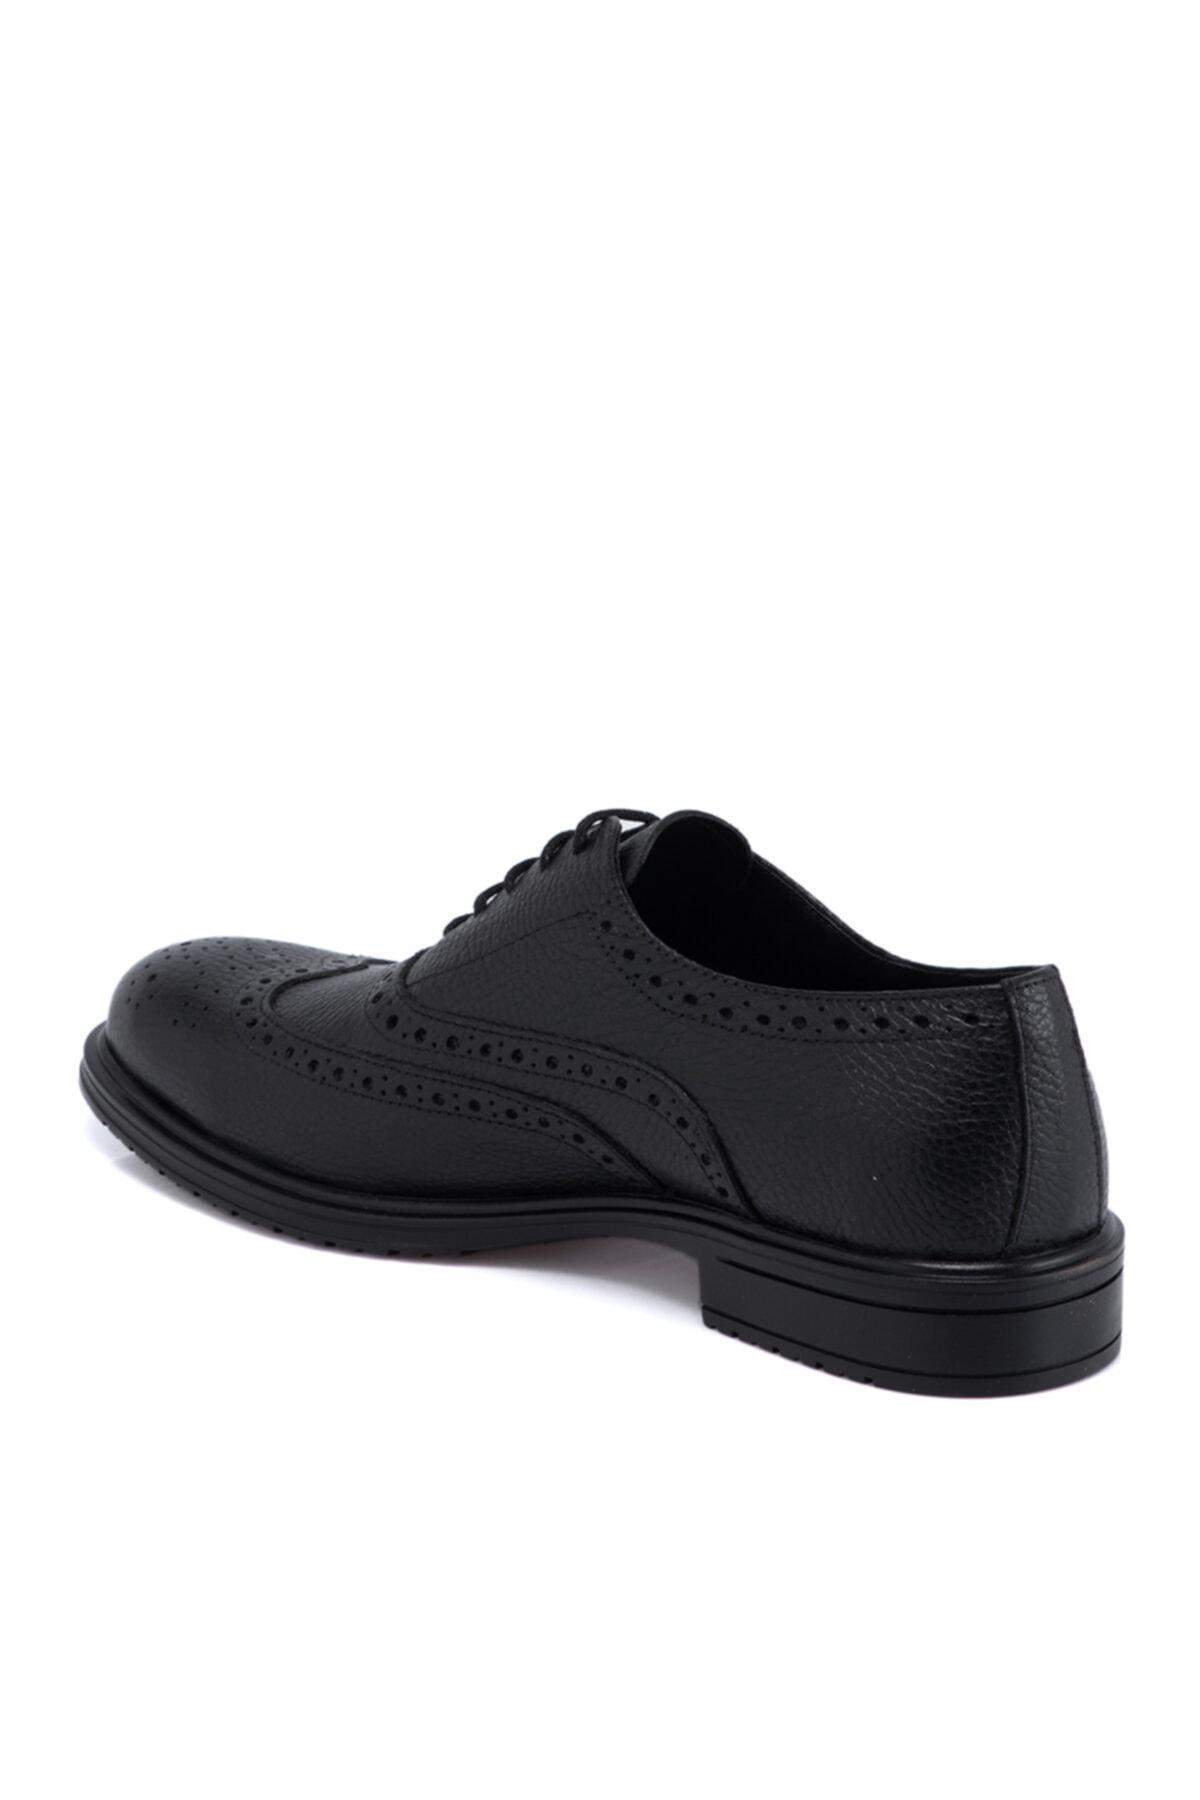 Tergan Siyah Deri Erkek Ayakkabı 55059a41 2